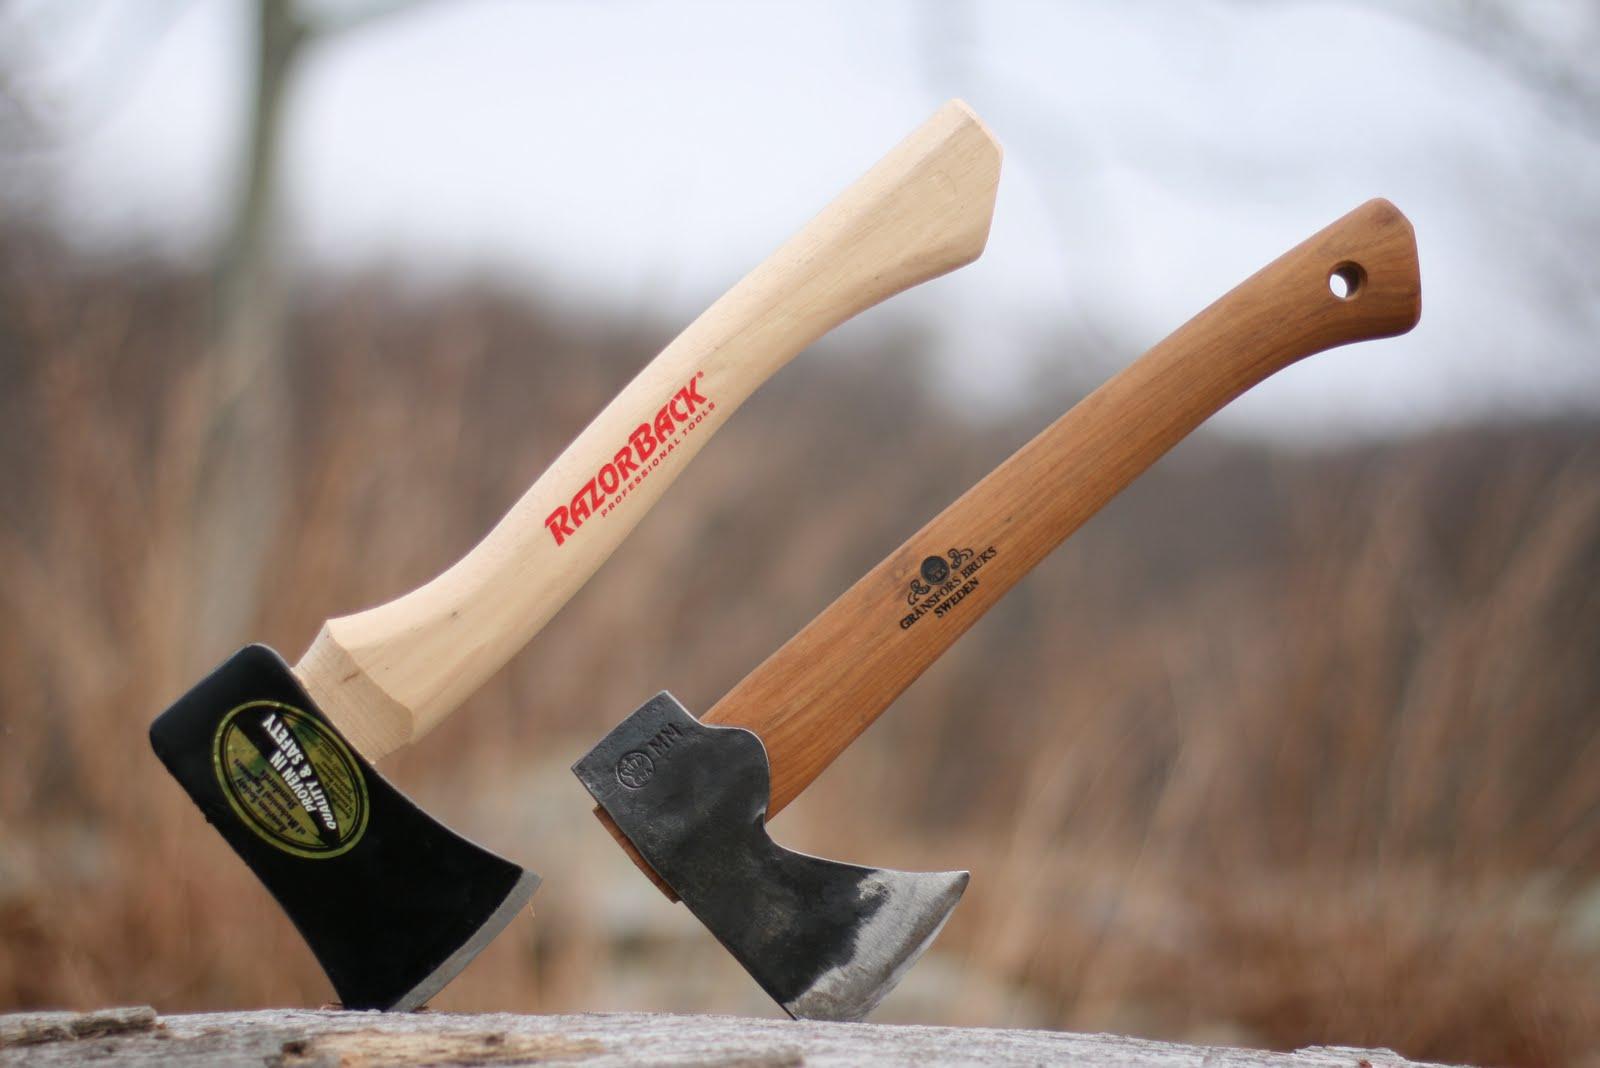 Bushcraft Made in USA 1.75 lb Council Tool Hudson Bay Camp Axe 28 inch